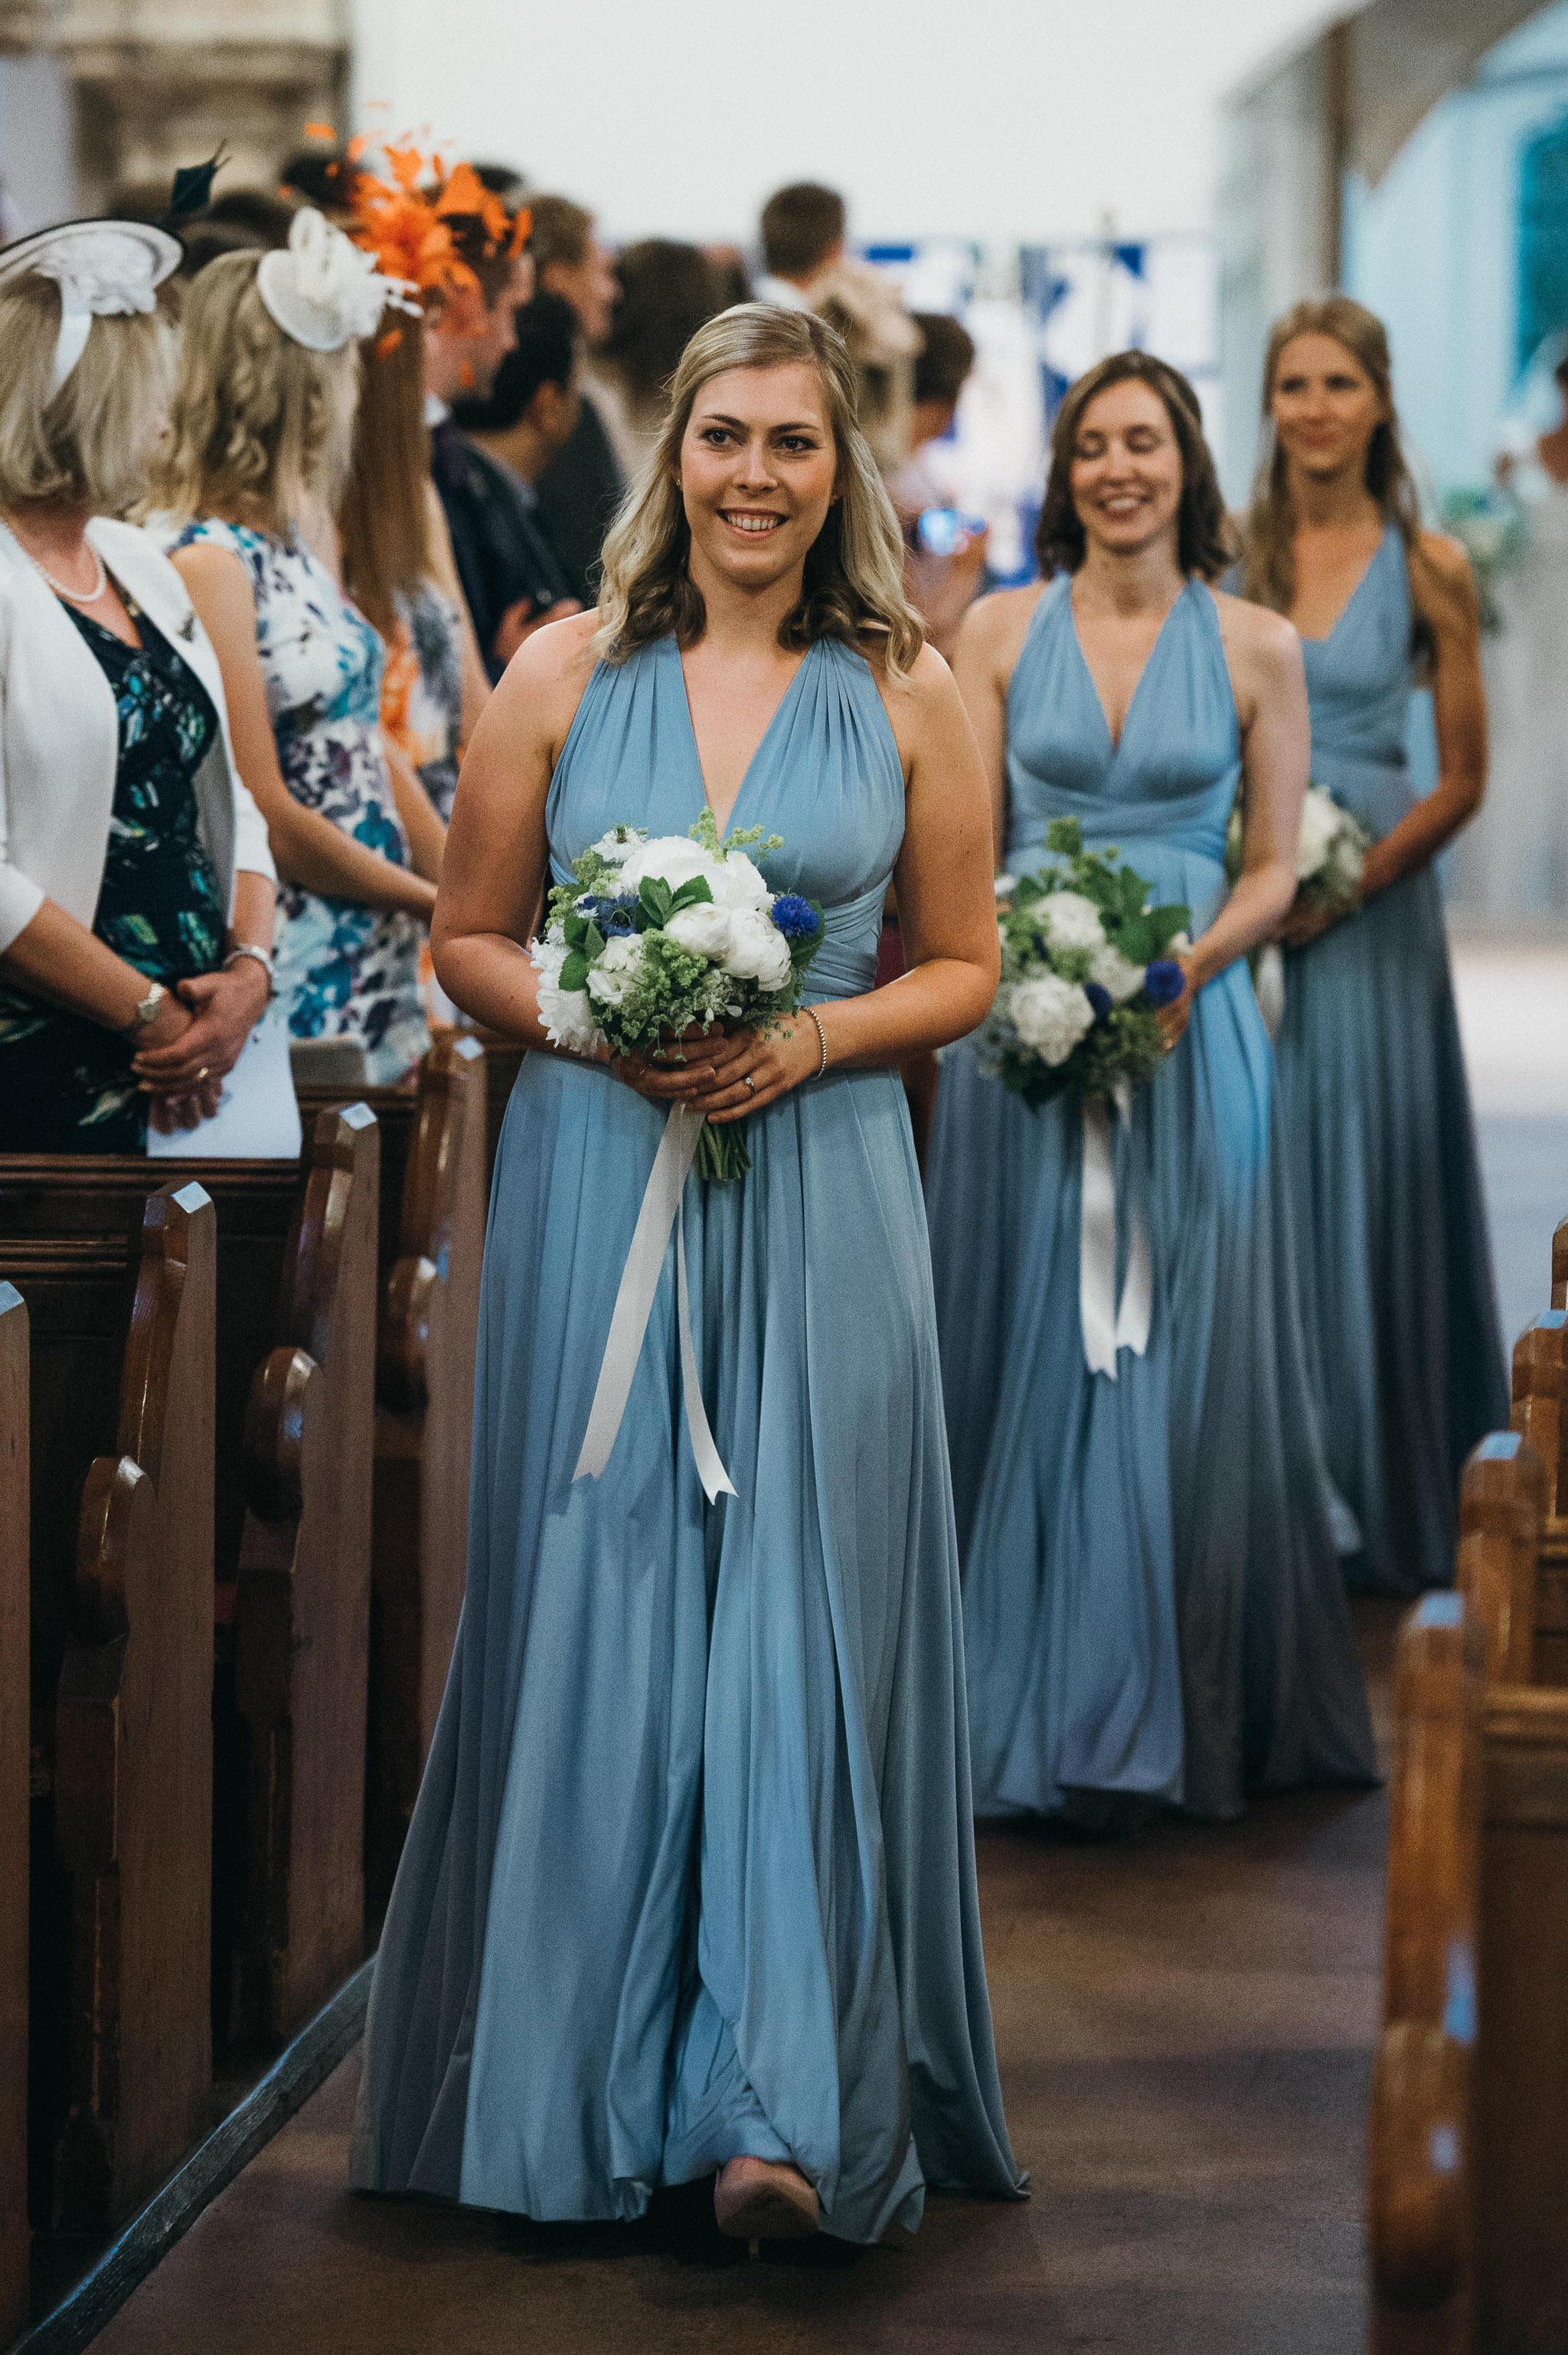 Bridesmaids walk down aisle